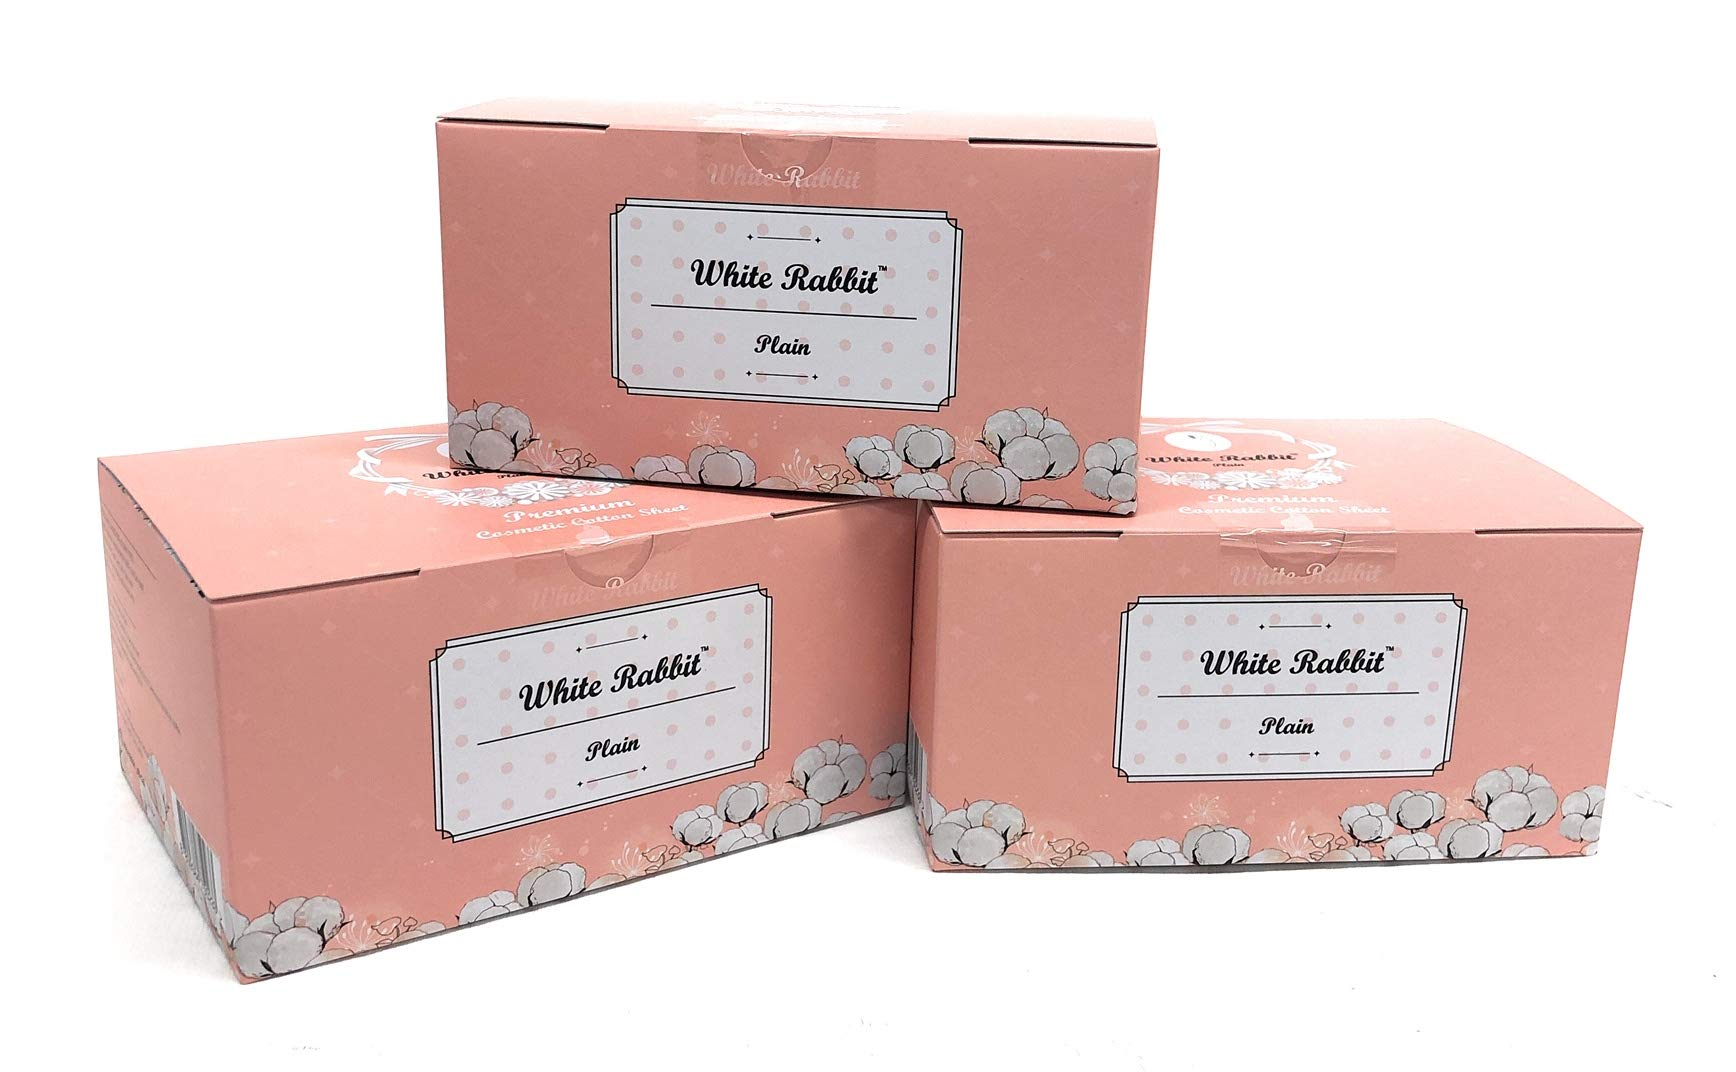 White Rabbit Premium Cotton Pad Authentic Korean 100% cotton- box of 200 cotton Pads